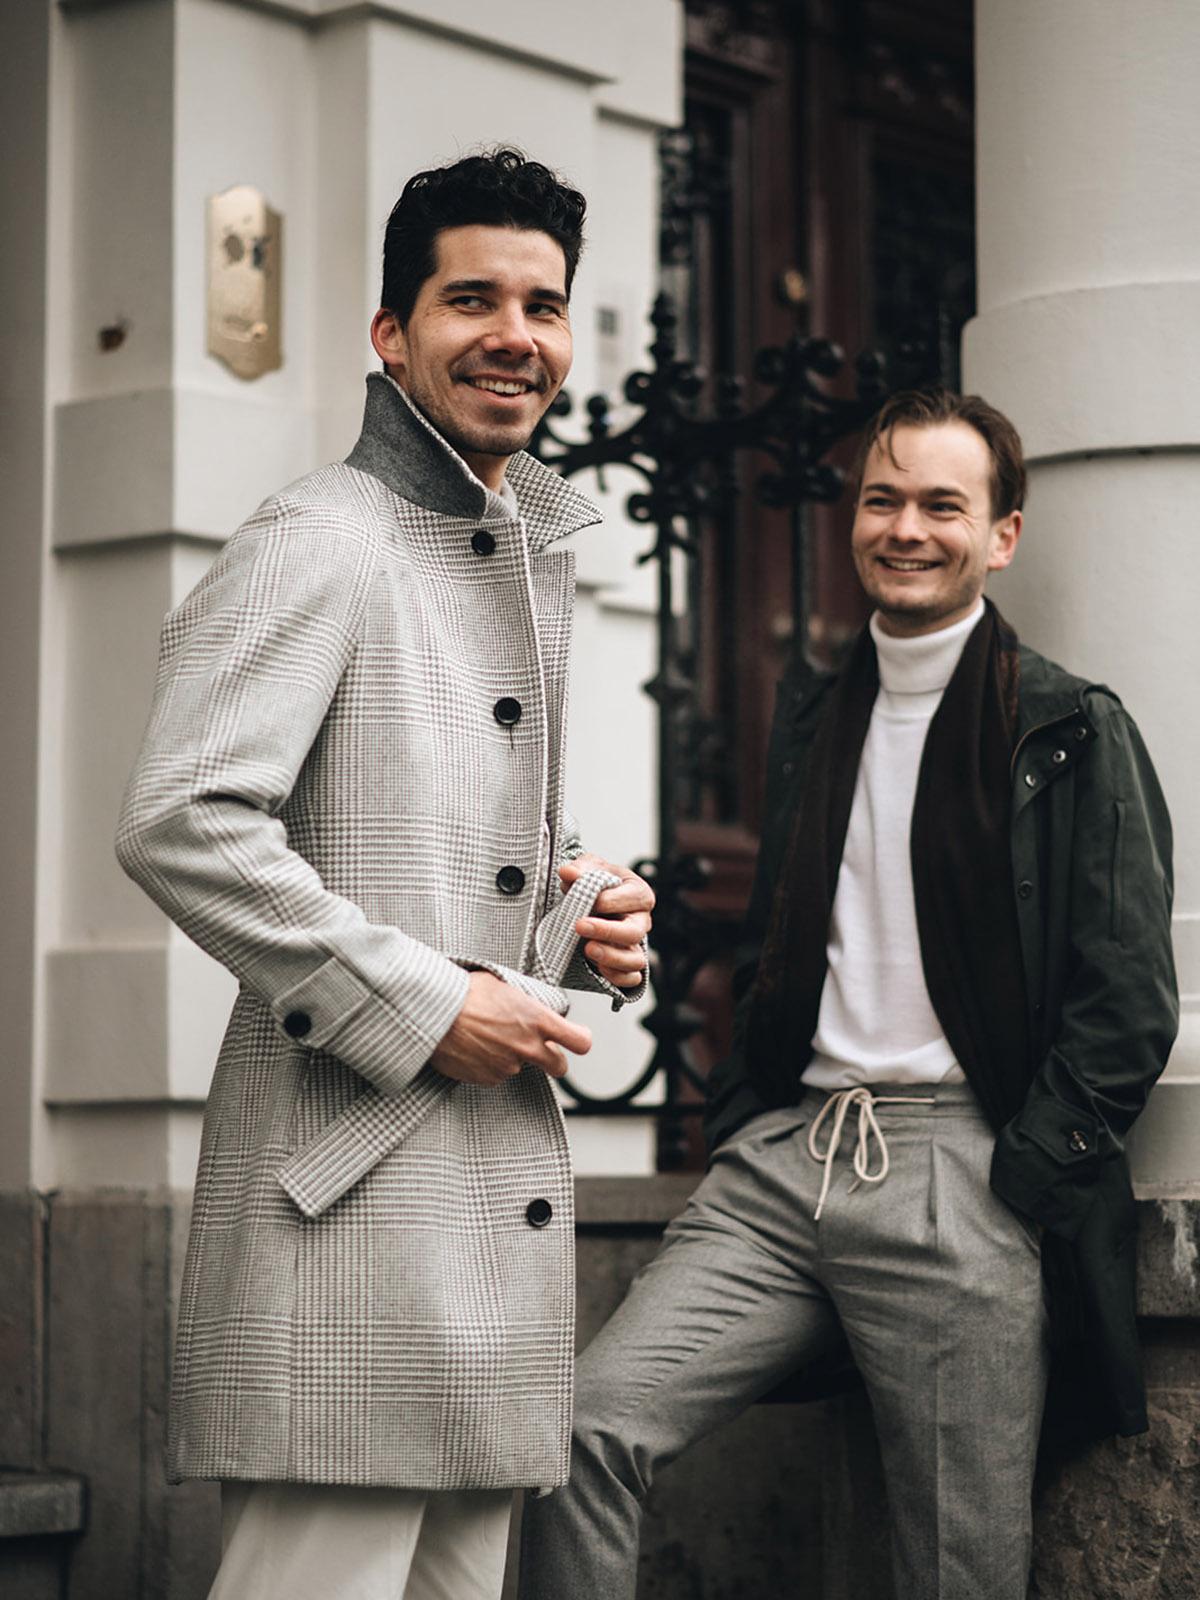 Prince op Wales dugdale overcoat, touwtjes pantalon